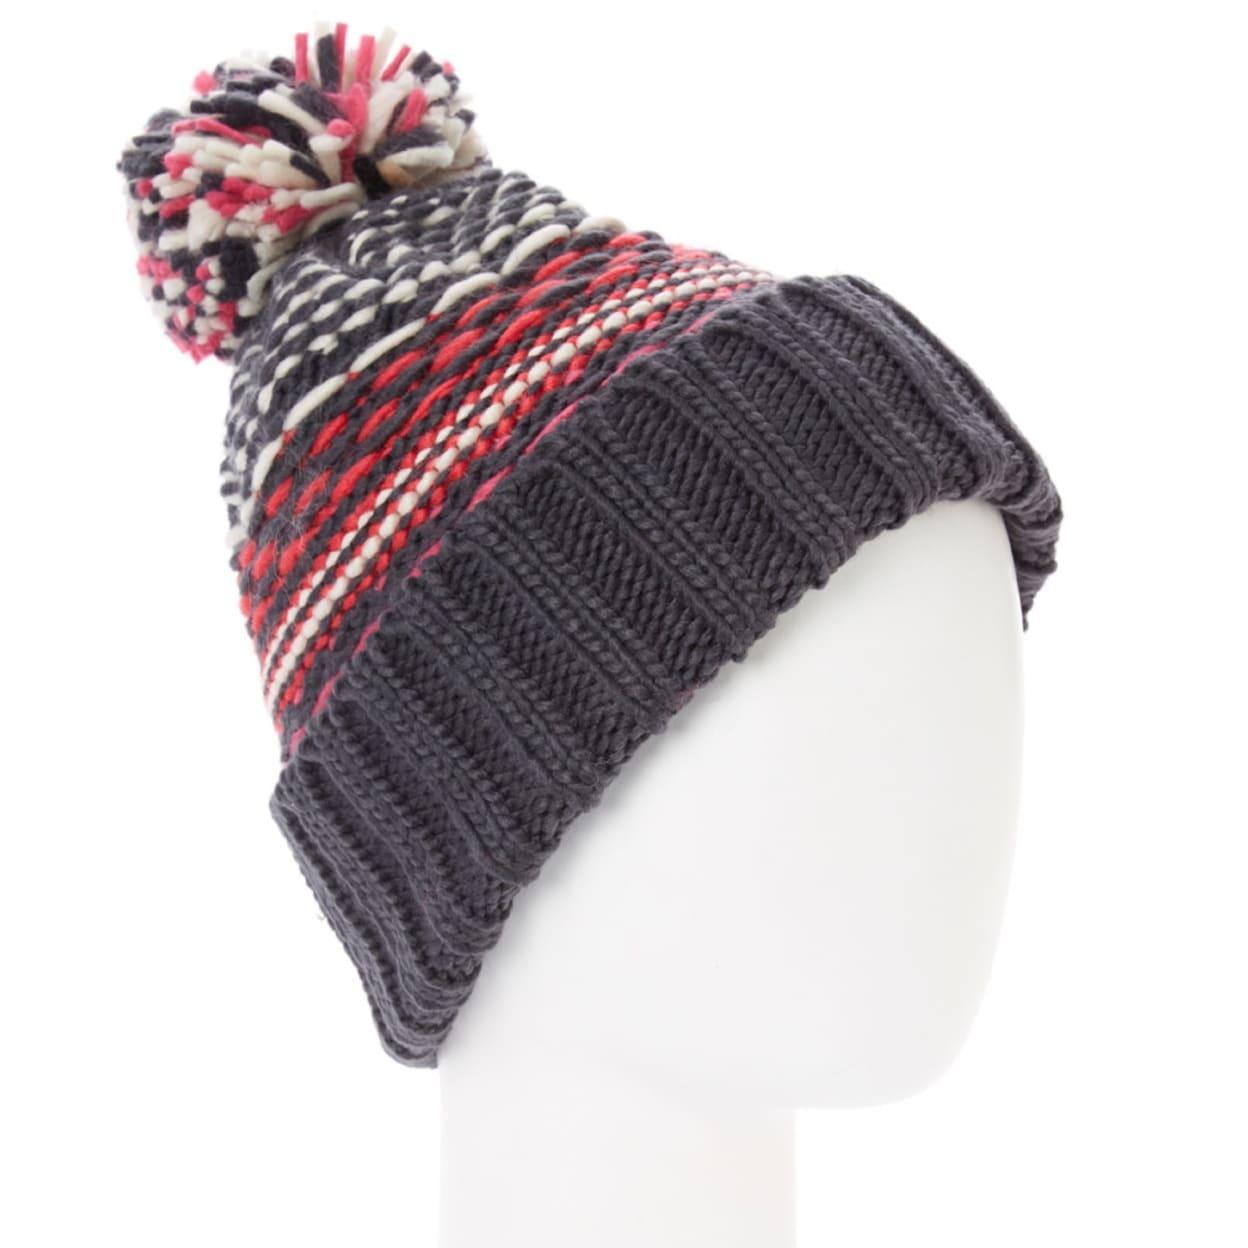 91c9c7cc8 Unisex Multicolor Stripe Pom-Pom Beanie Winter Casual Hat Snow Cap Winter  Warm Soft Cozy Christmas Holidays Gift